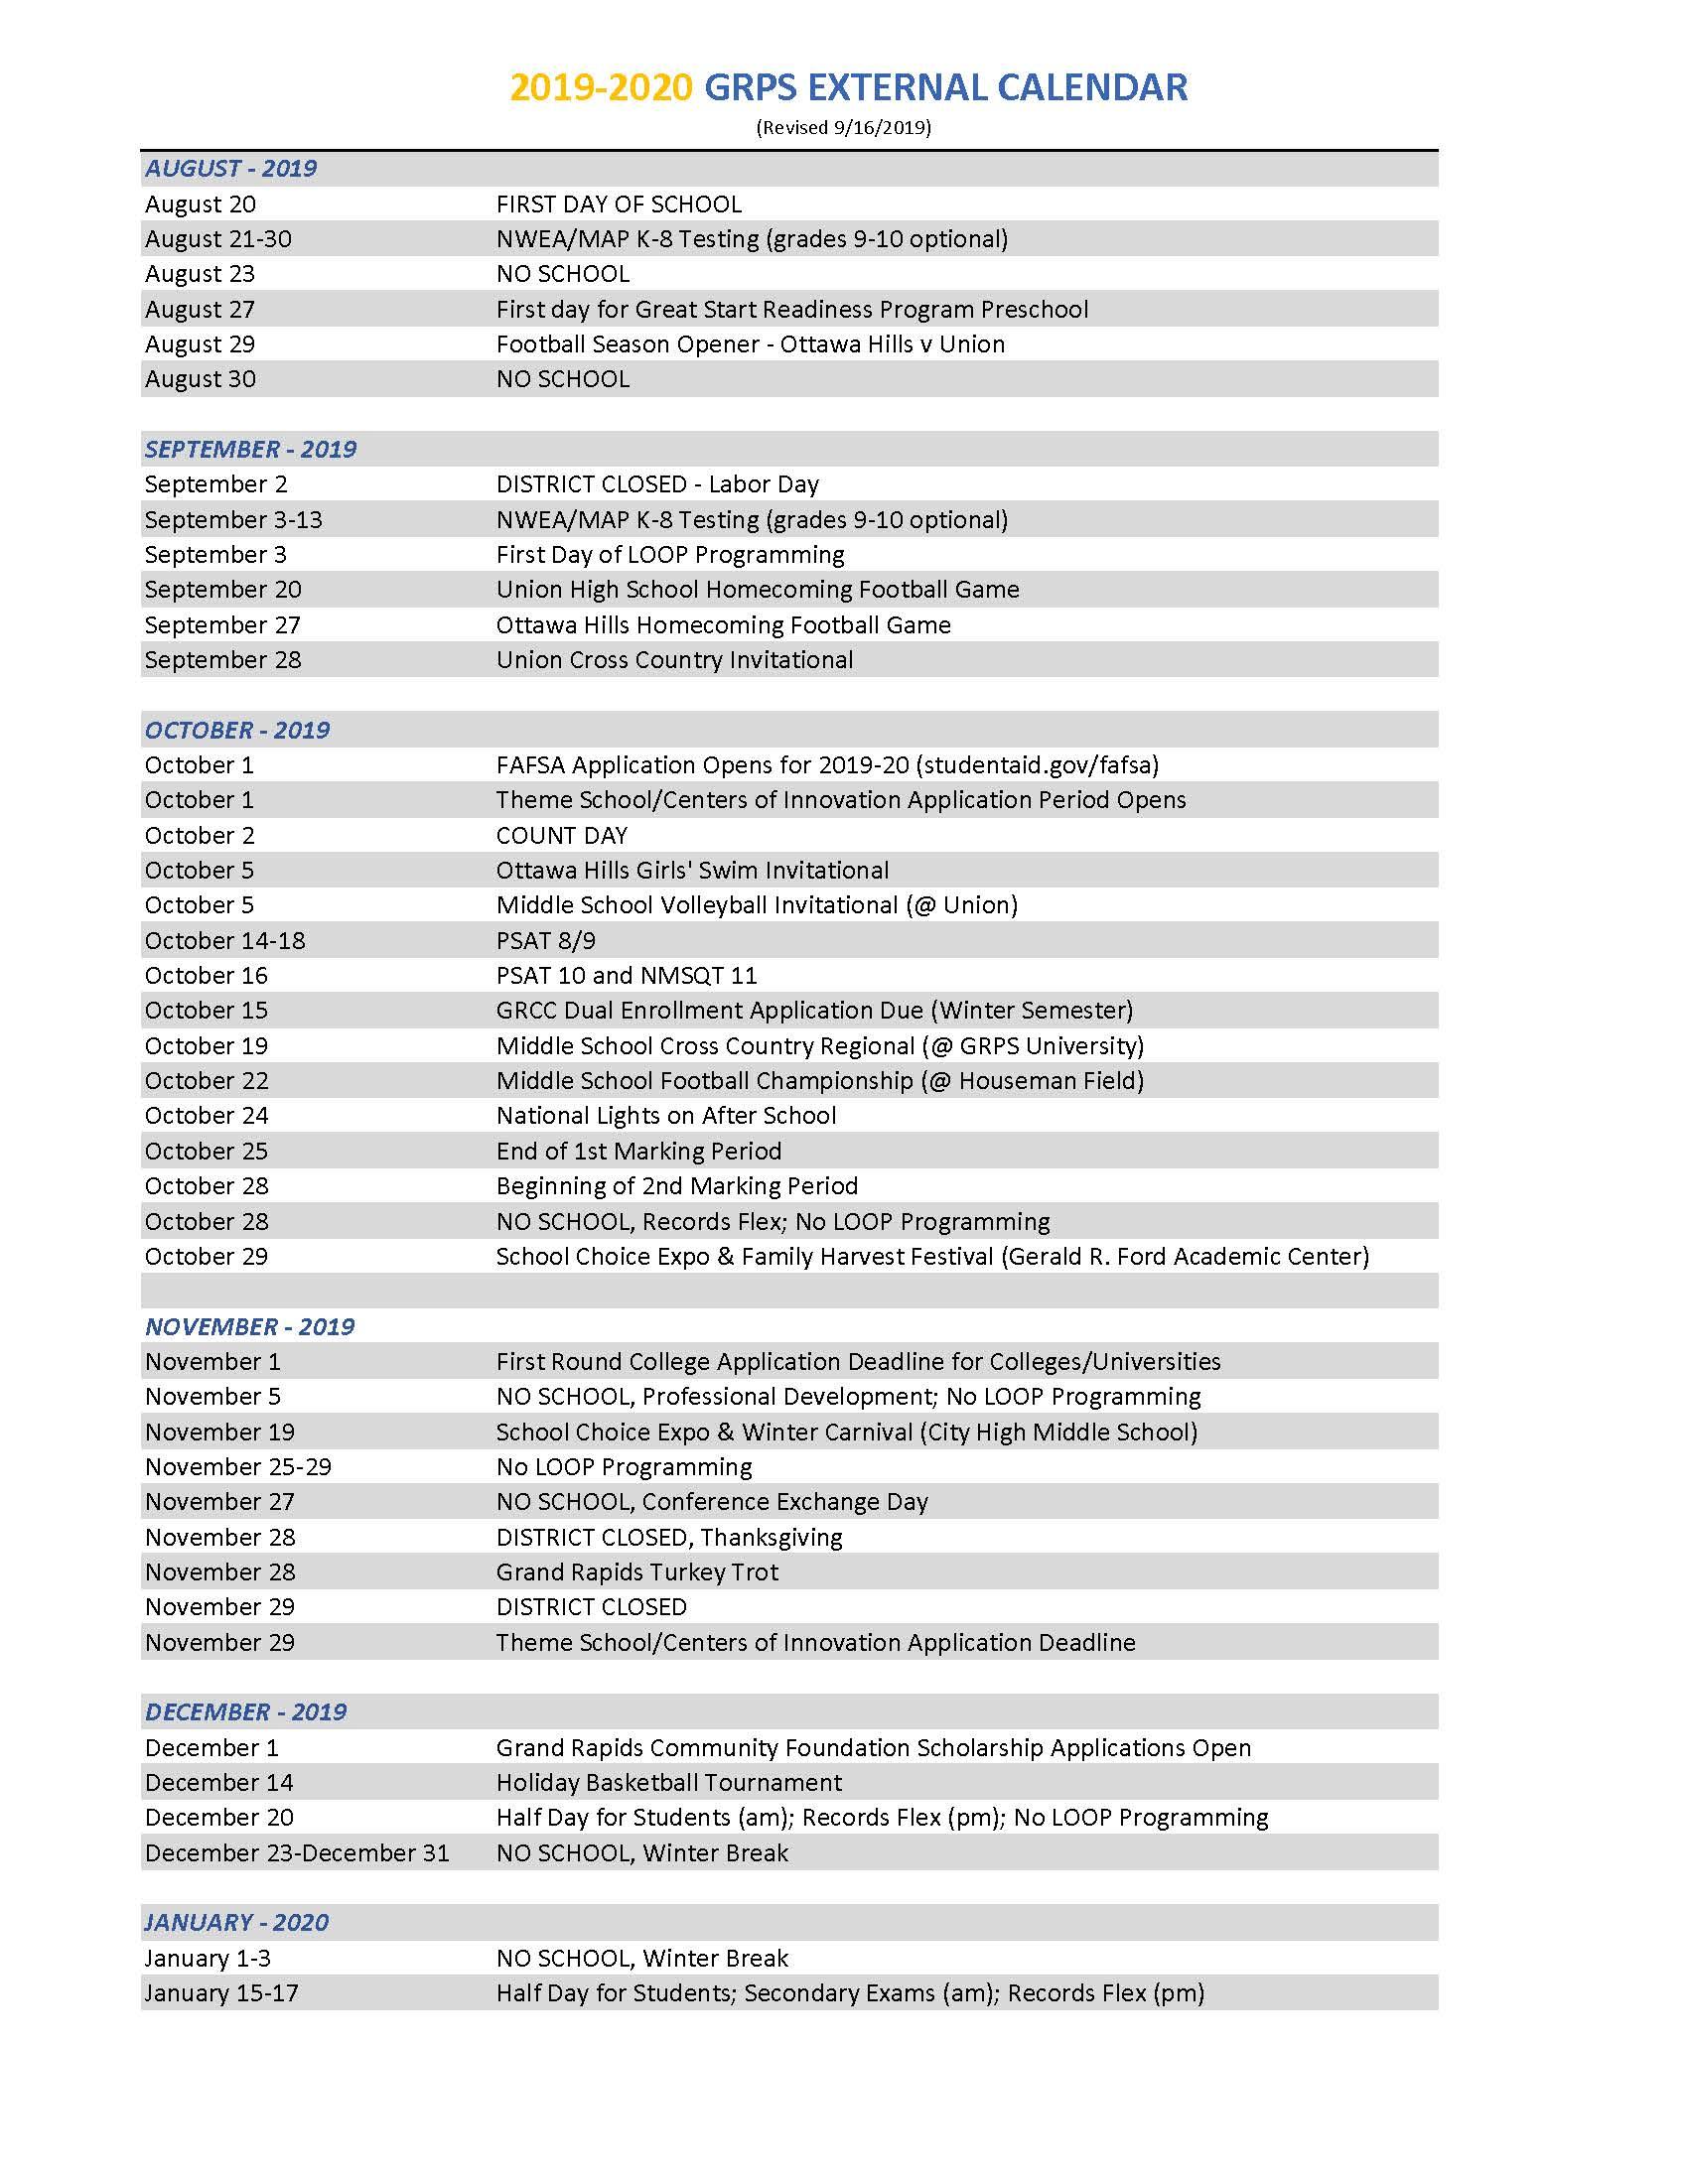 2019 2020 District Calendar For Kenosha Unified Spring Break 2021